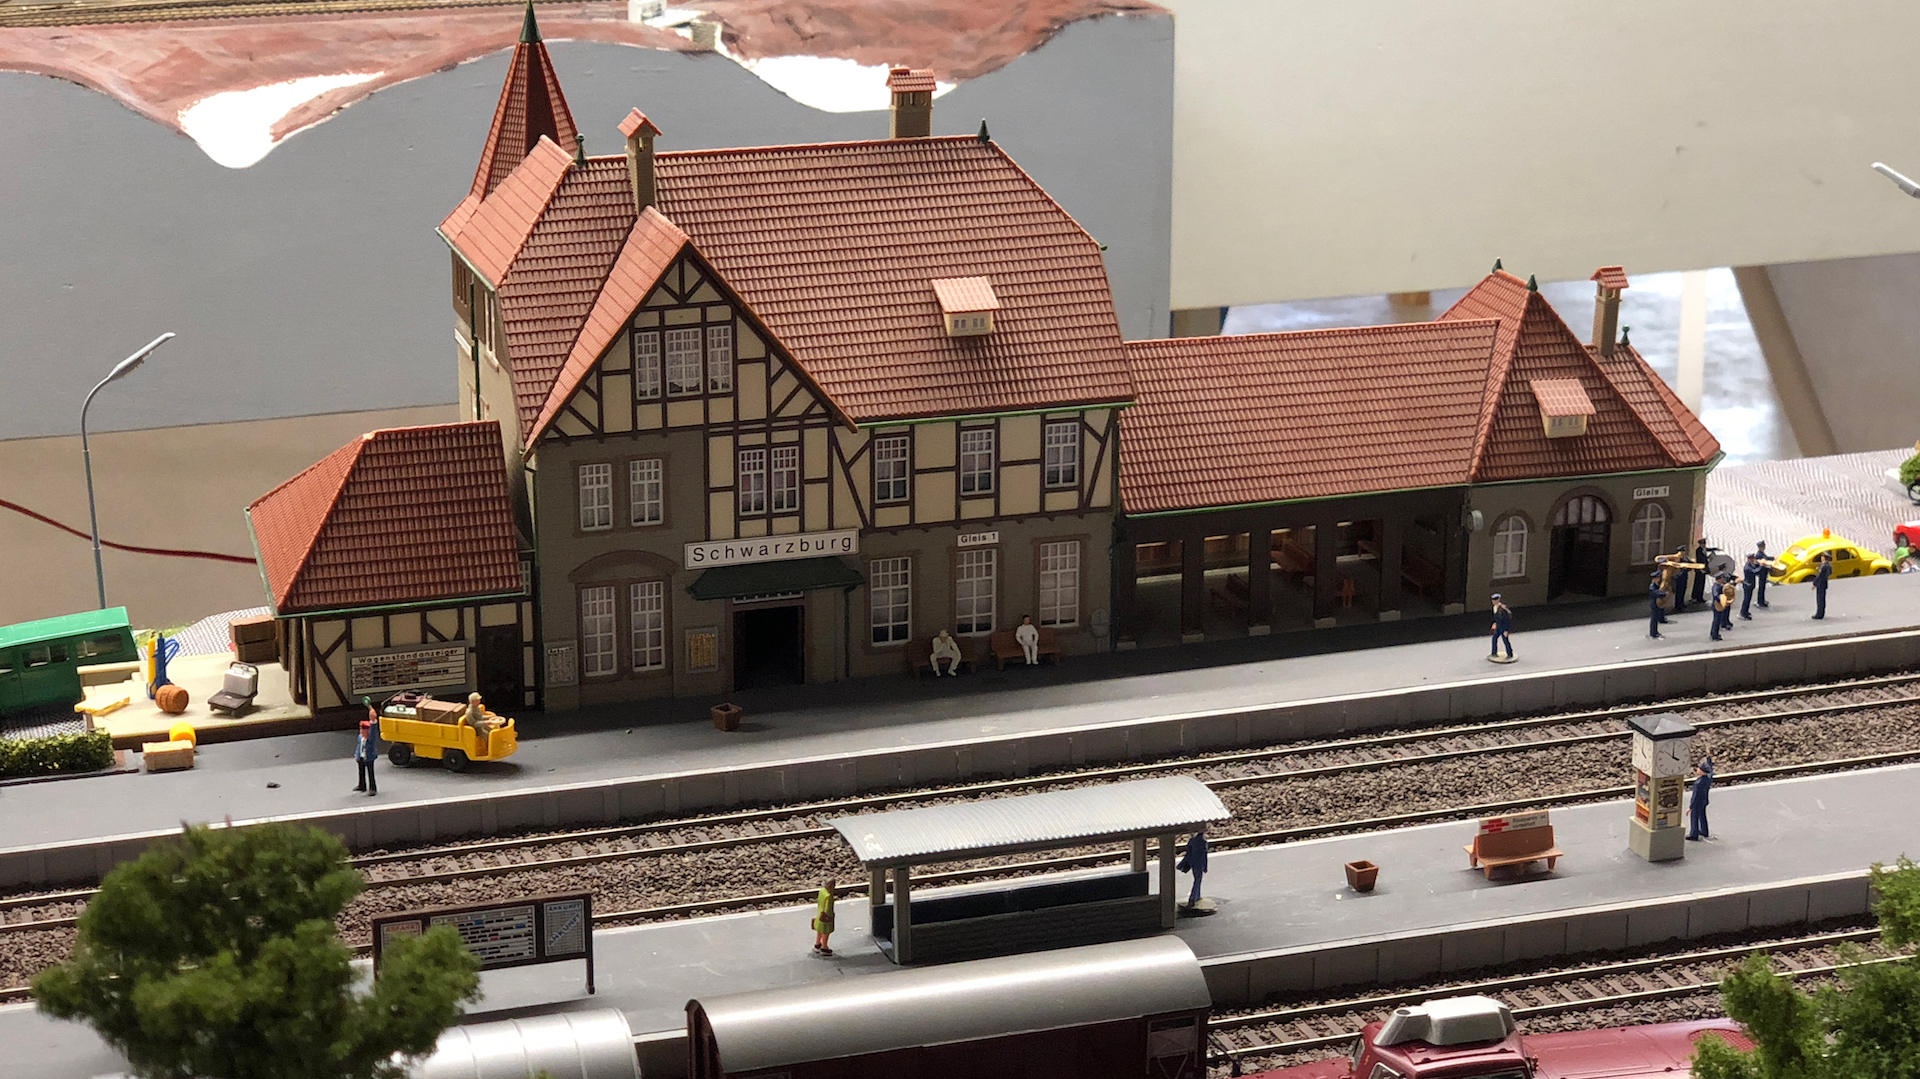 18_02_24_Schautag-Eisenbahnfreunde-Hameln_025